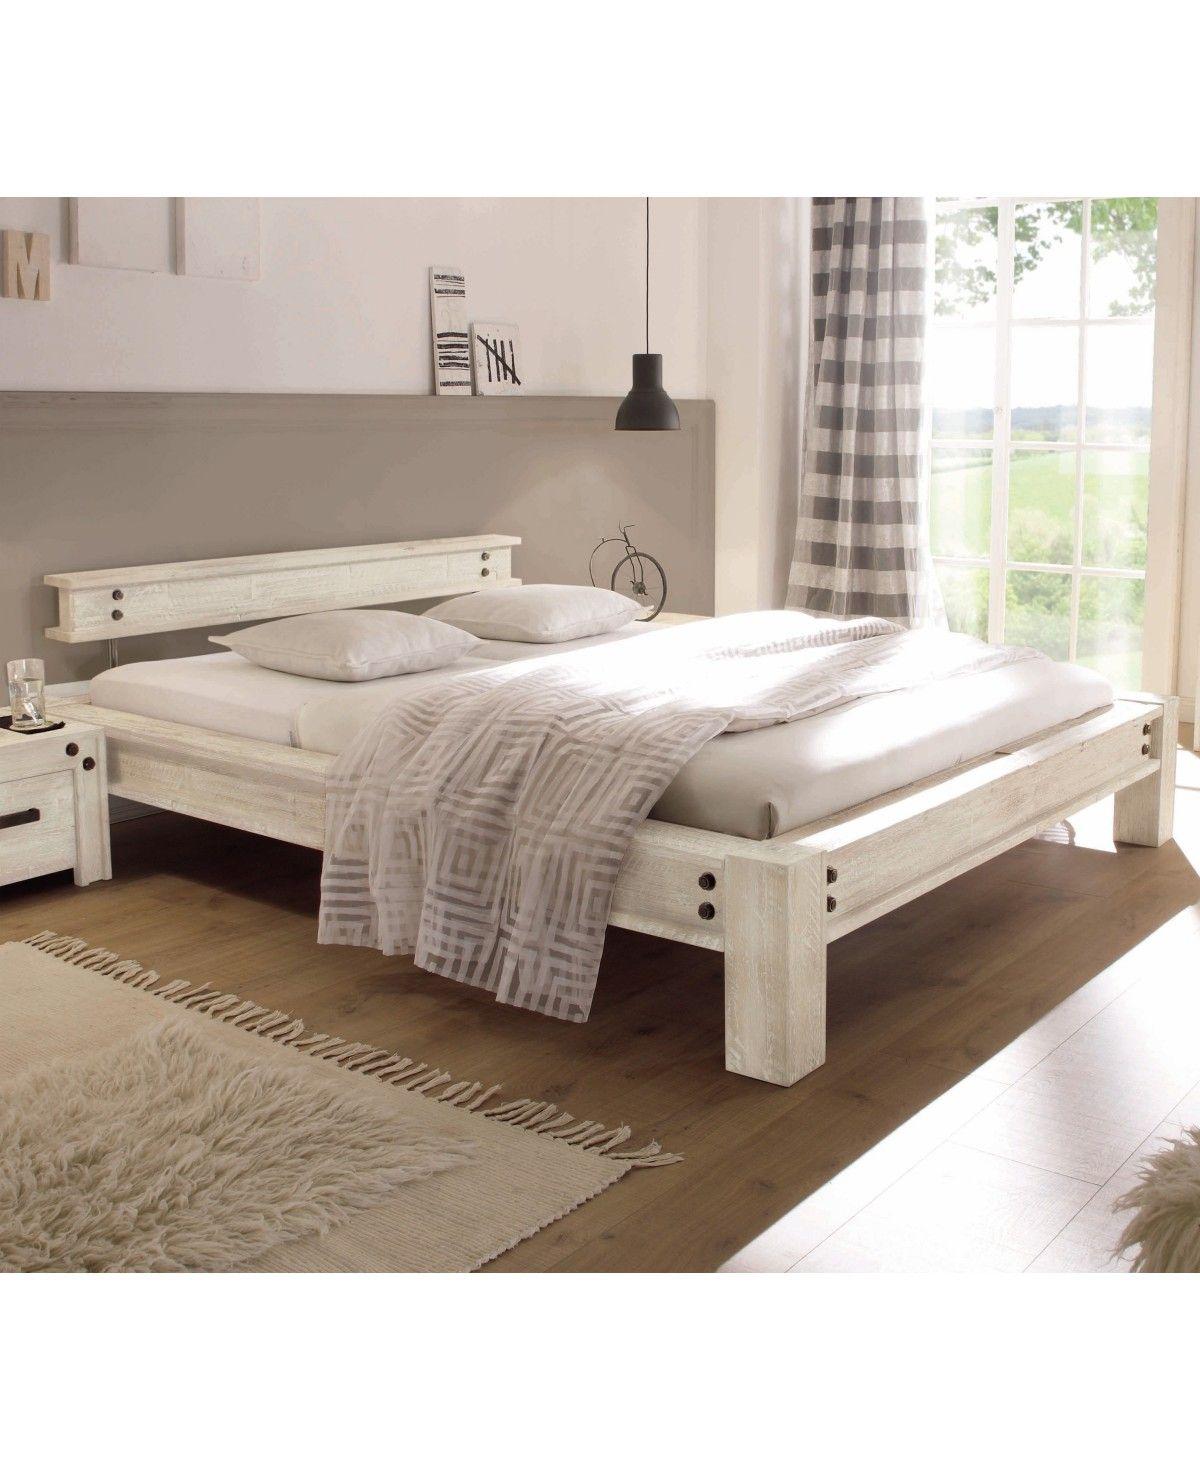 Hasena Factory Line Loft Stil Bett San Luca Akazie Vintage White 140x200